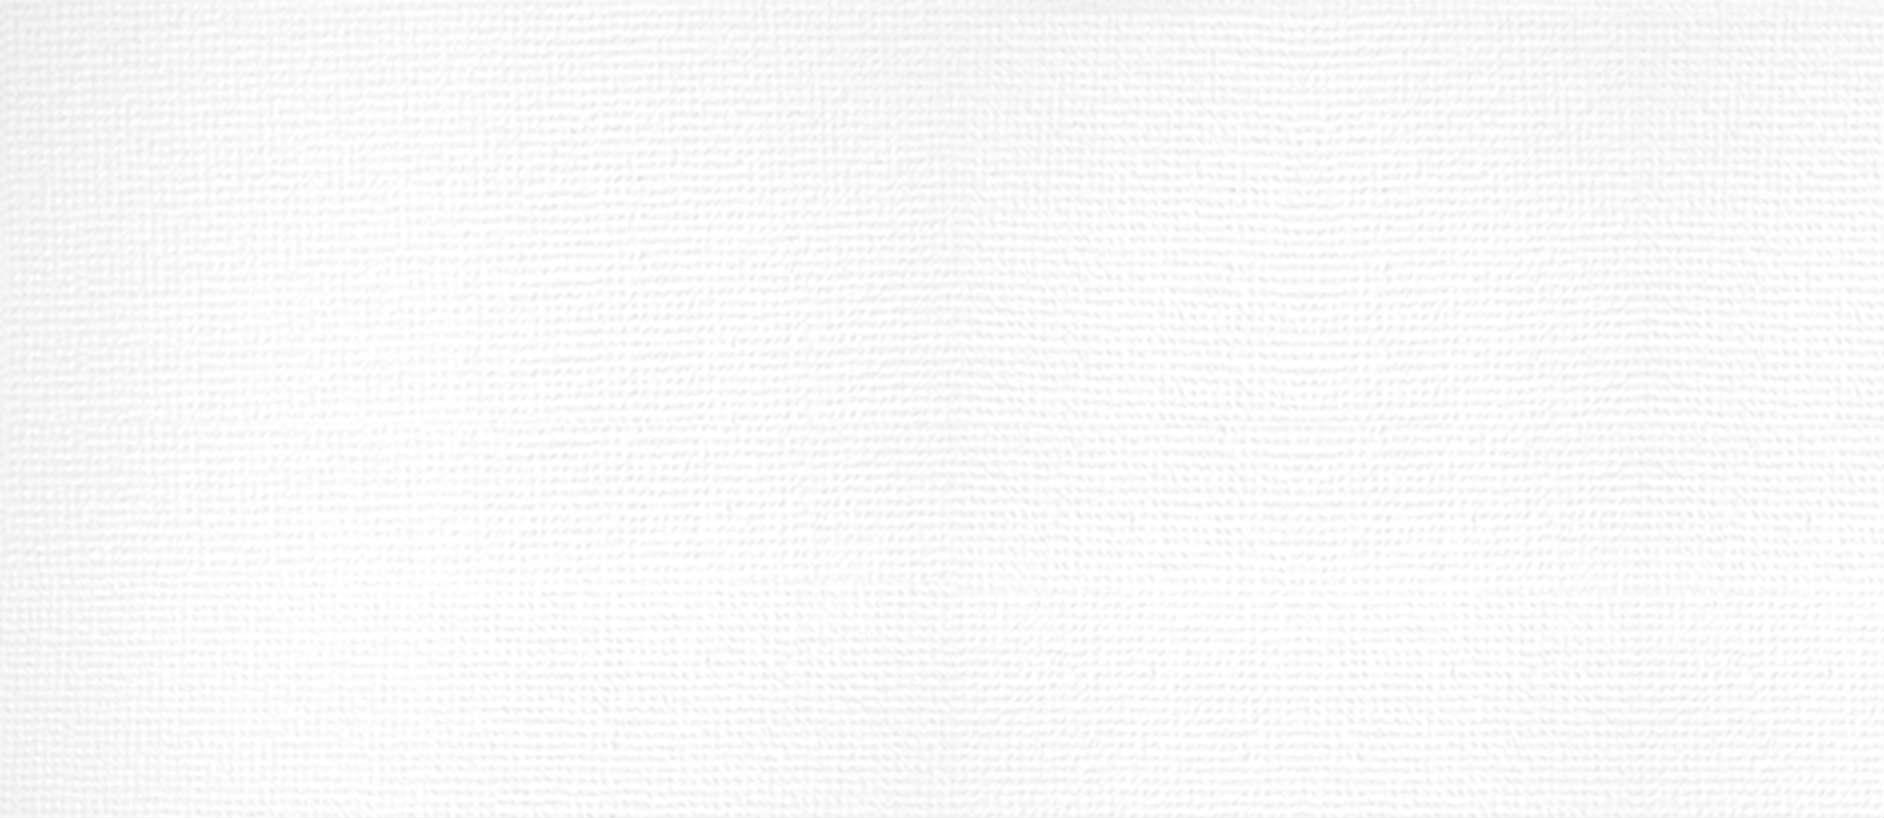 Background Textured Paper White